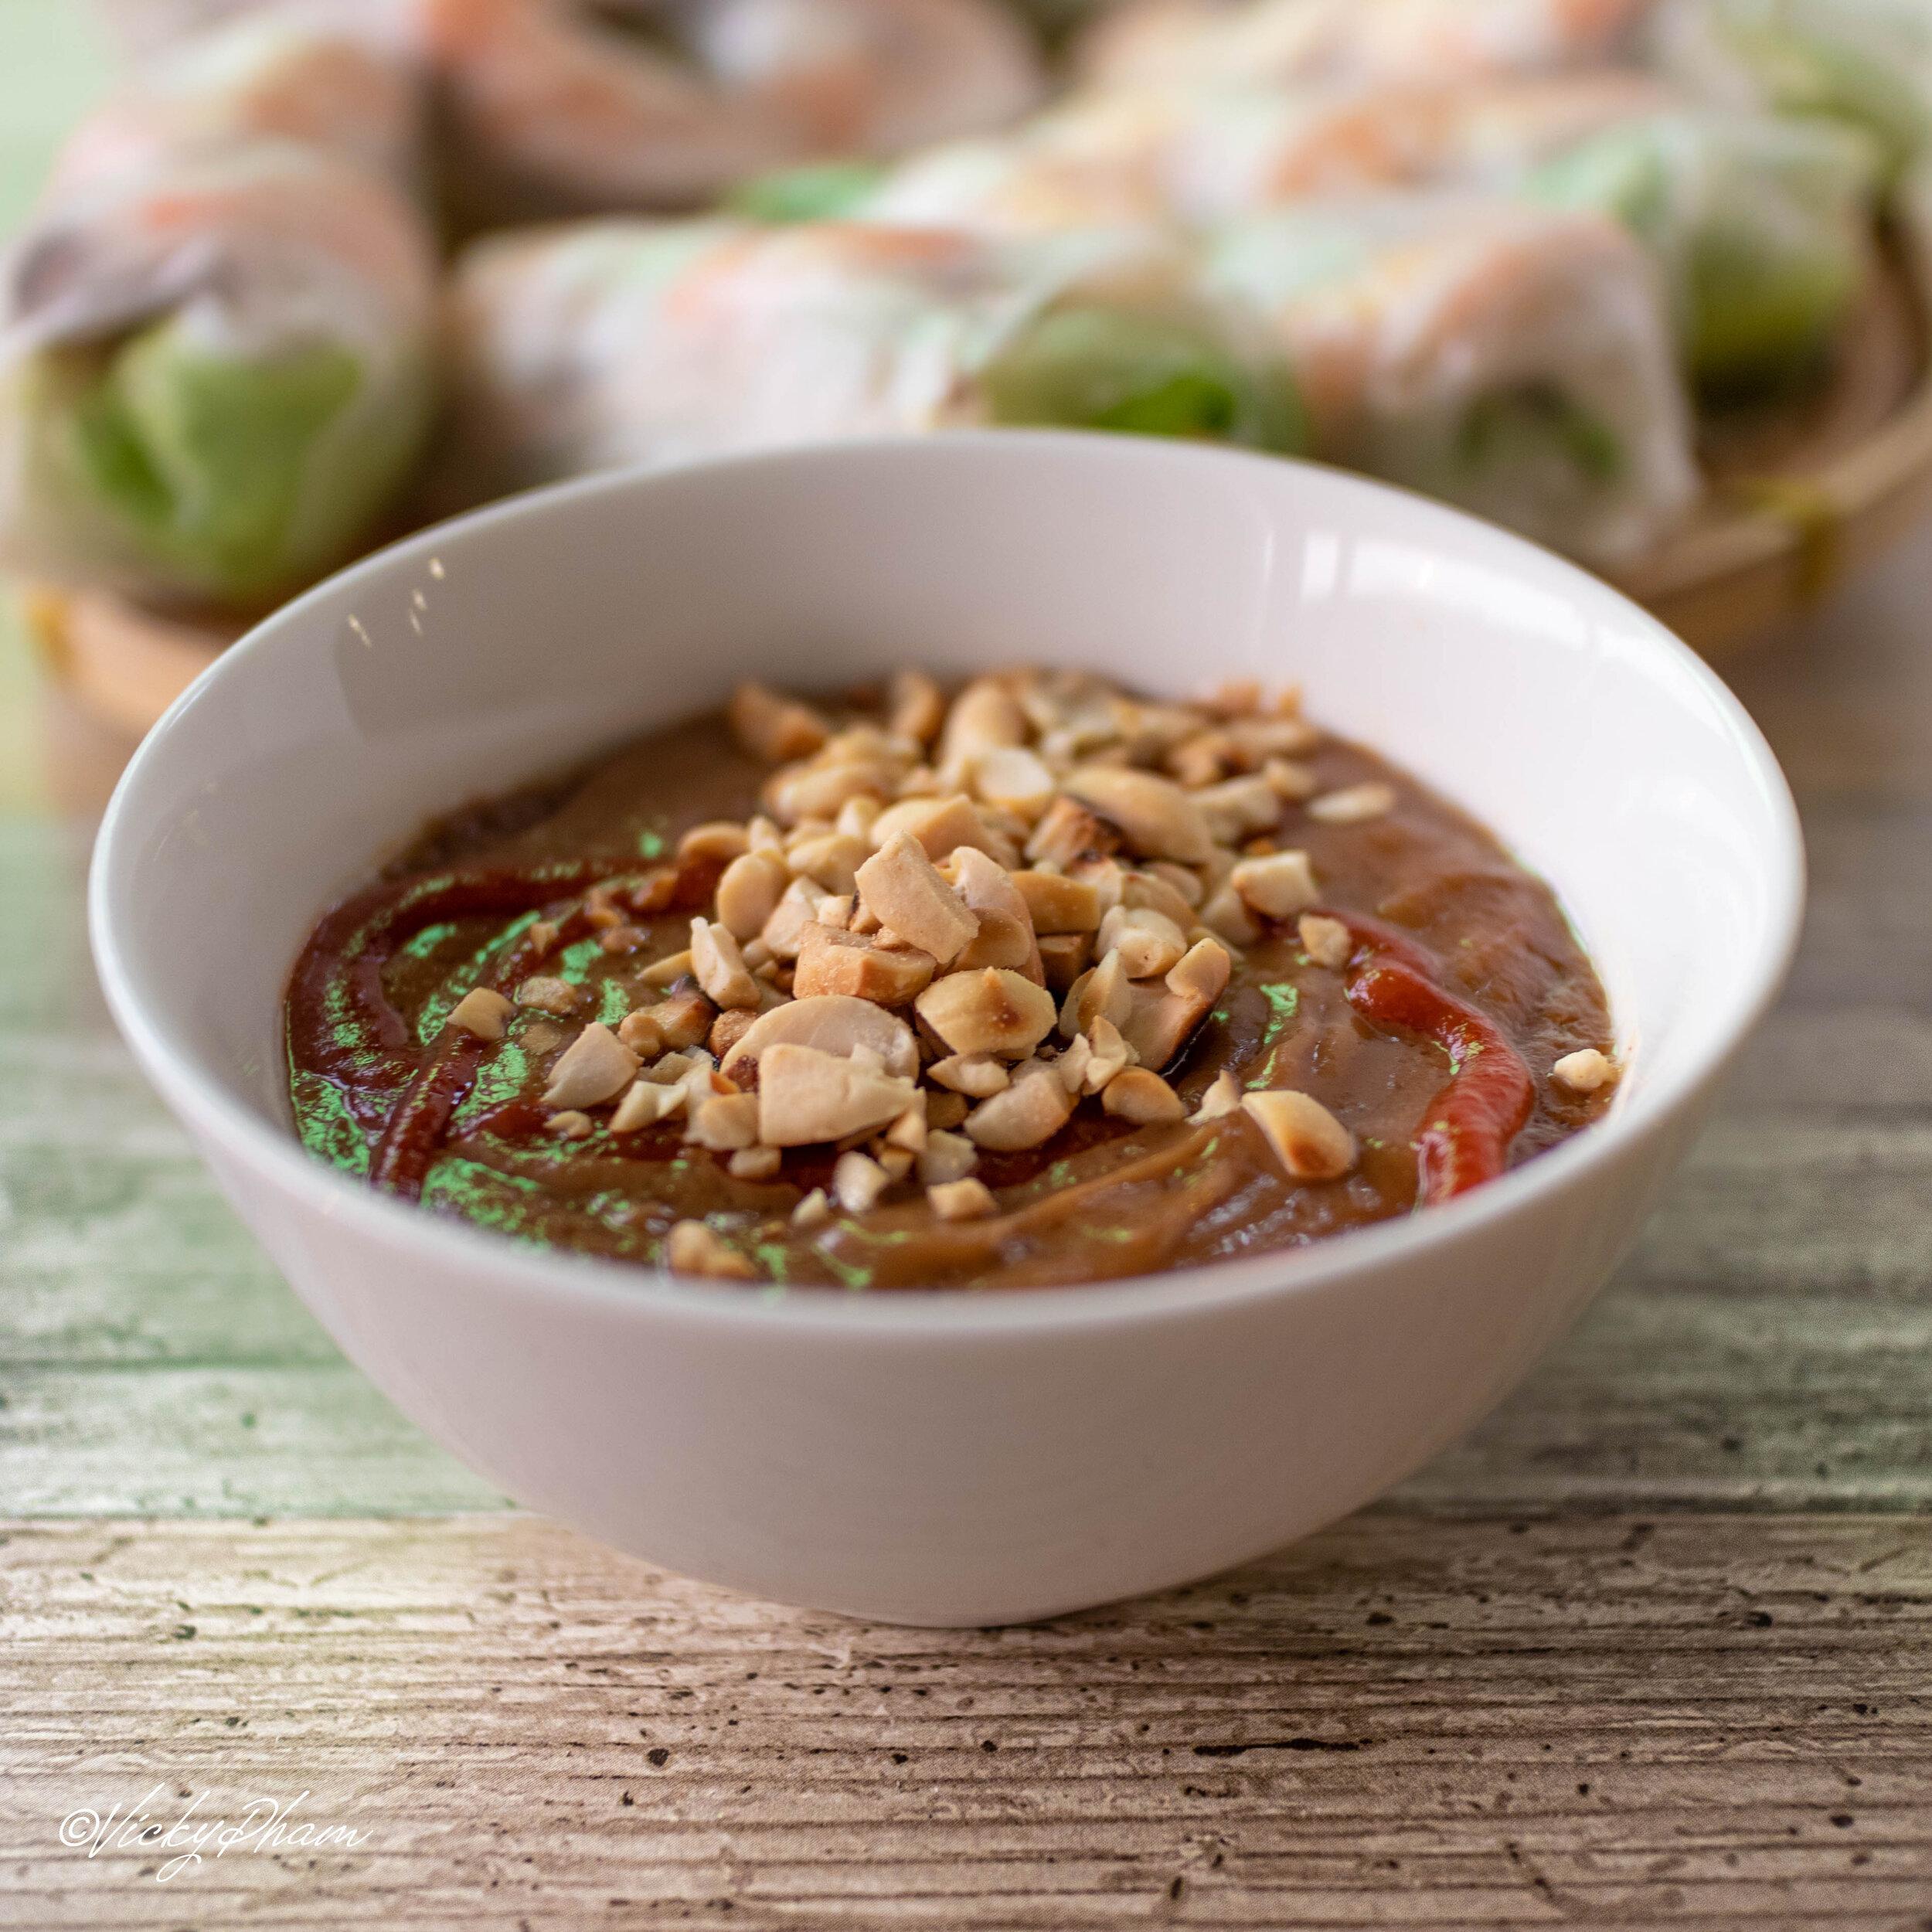 Vietnamese Peanut Dipping Sauce For Spring Rolls Tương Chấm Gỏi Cuốn Vietnamese Home Cooking Recipes